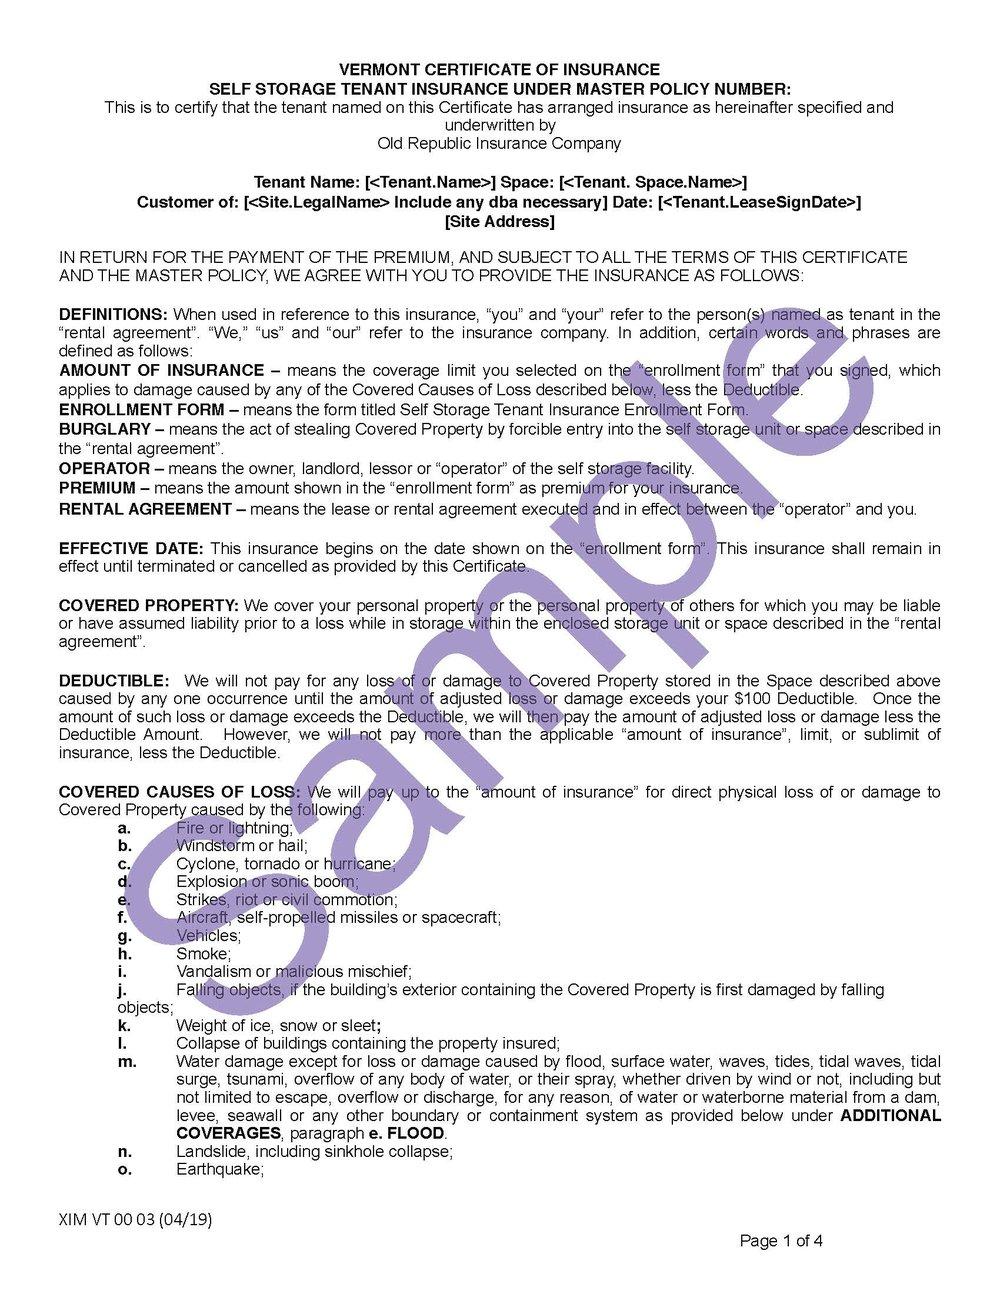 XIM VT 00 03 04 19 Vermont Certificate of InsuranceSample_Page_1.jpg